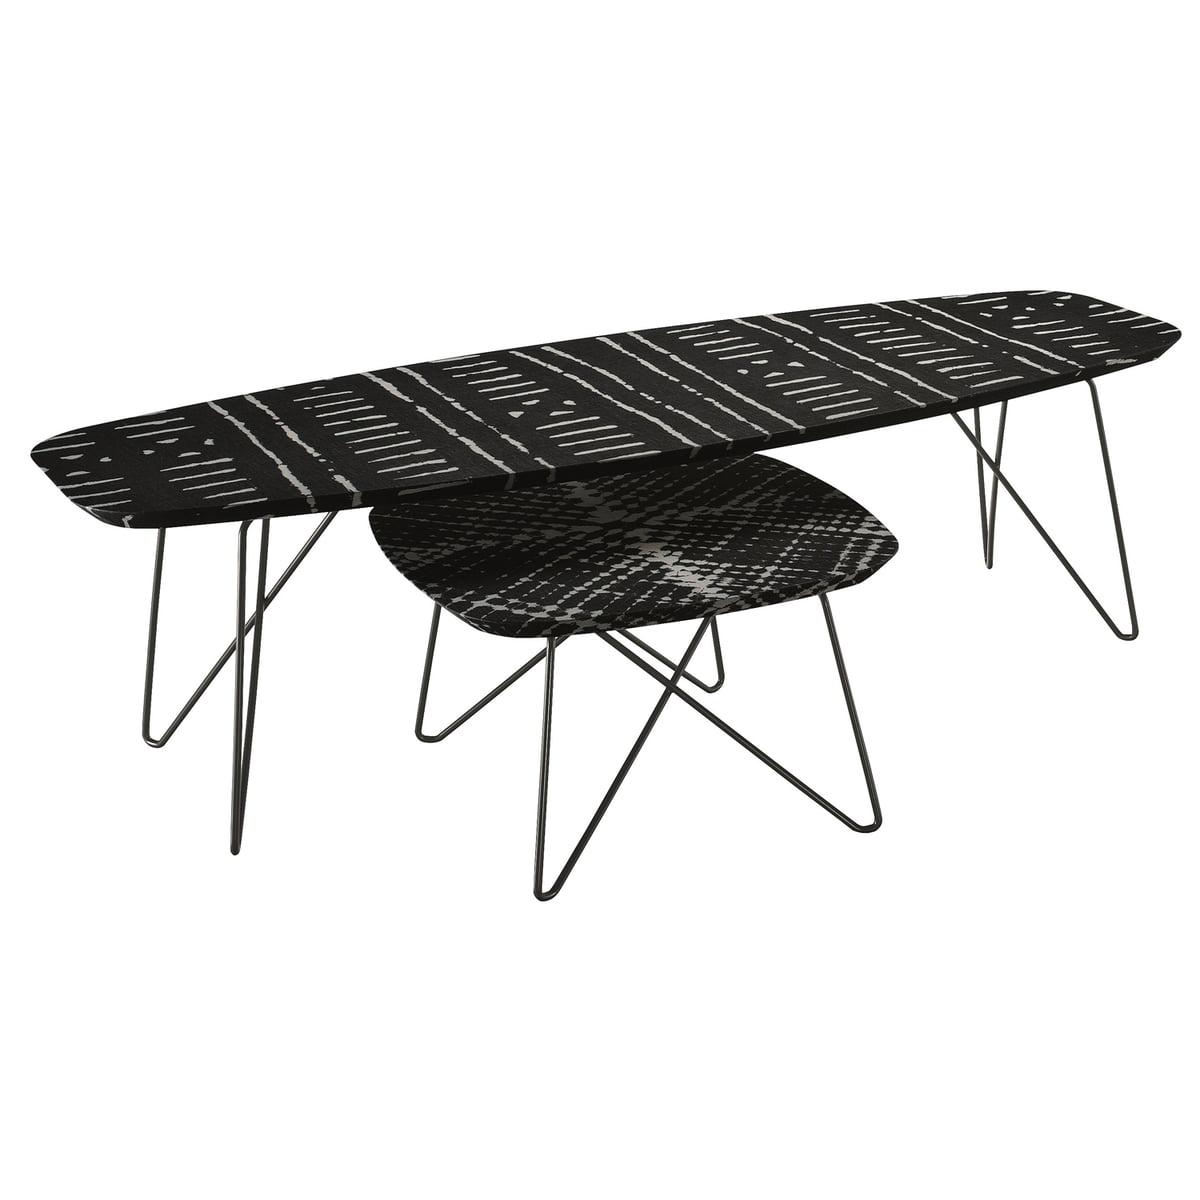 Zanotta ink couch table im shop zanotta ink side table 60 raute 160 h45 streif black greentooth Gallery